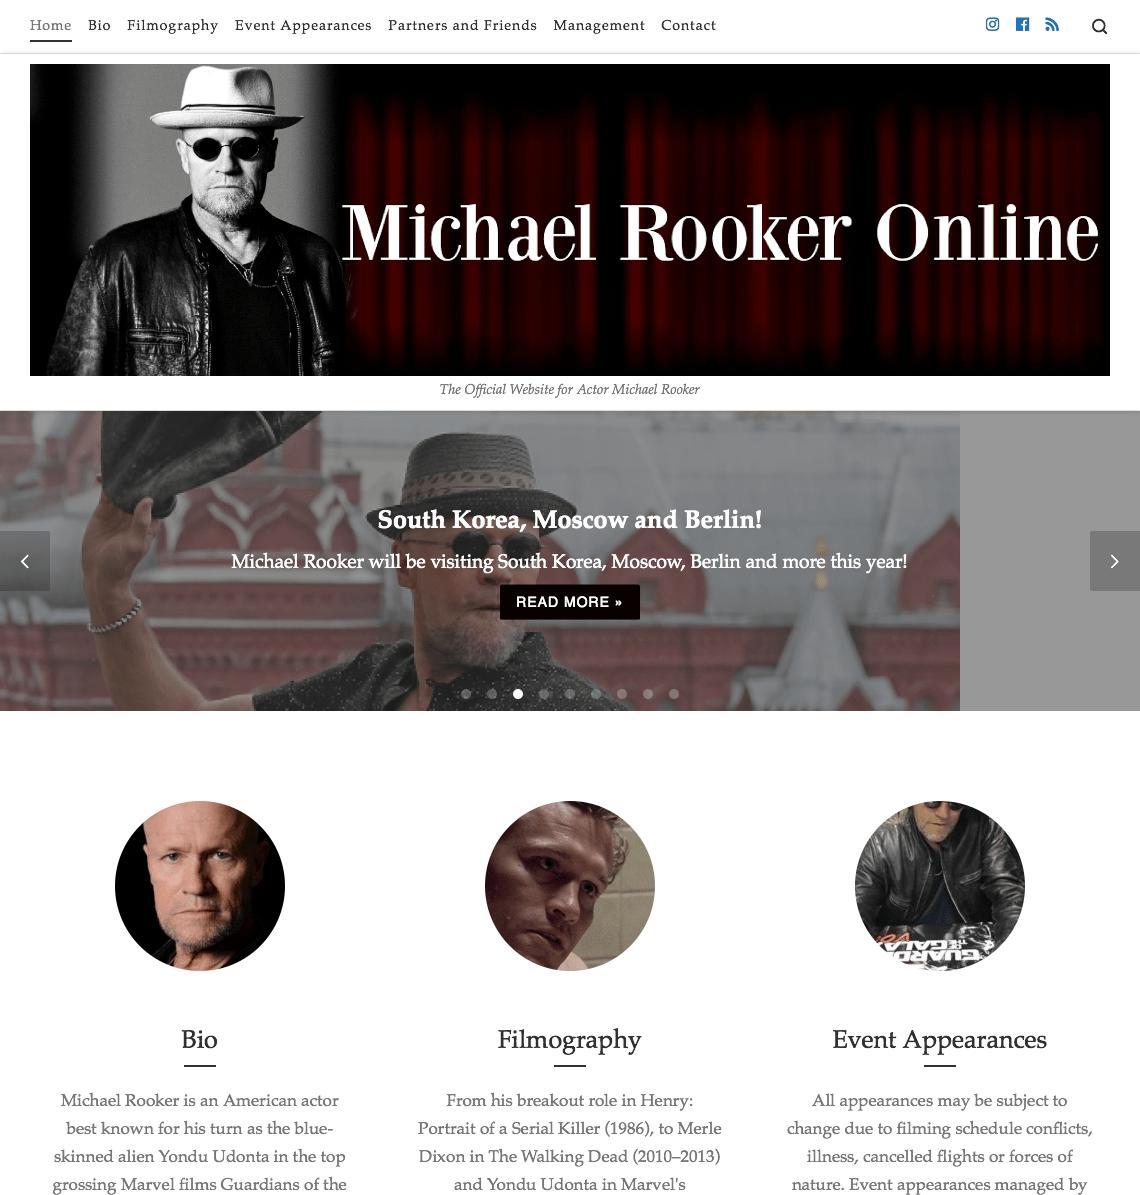 Michael Rooker Online